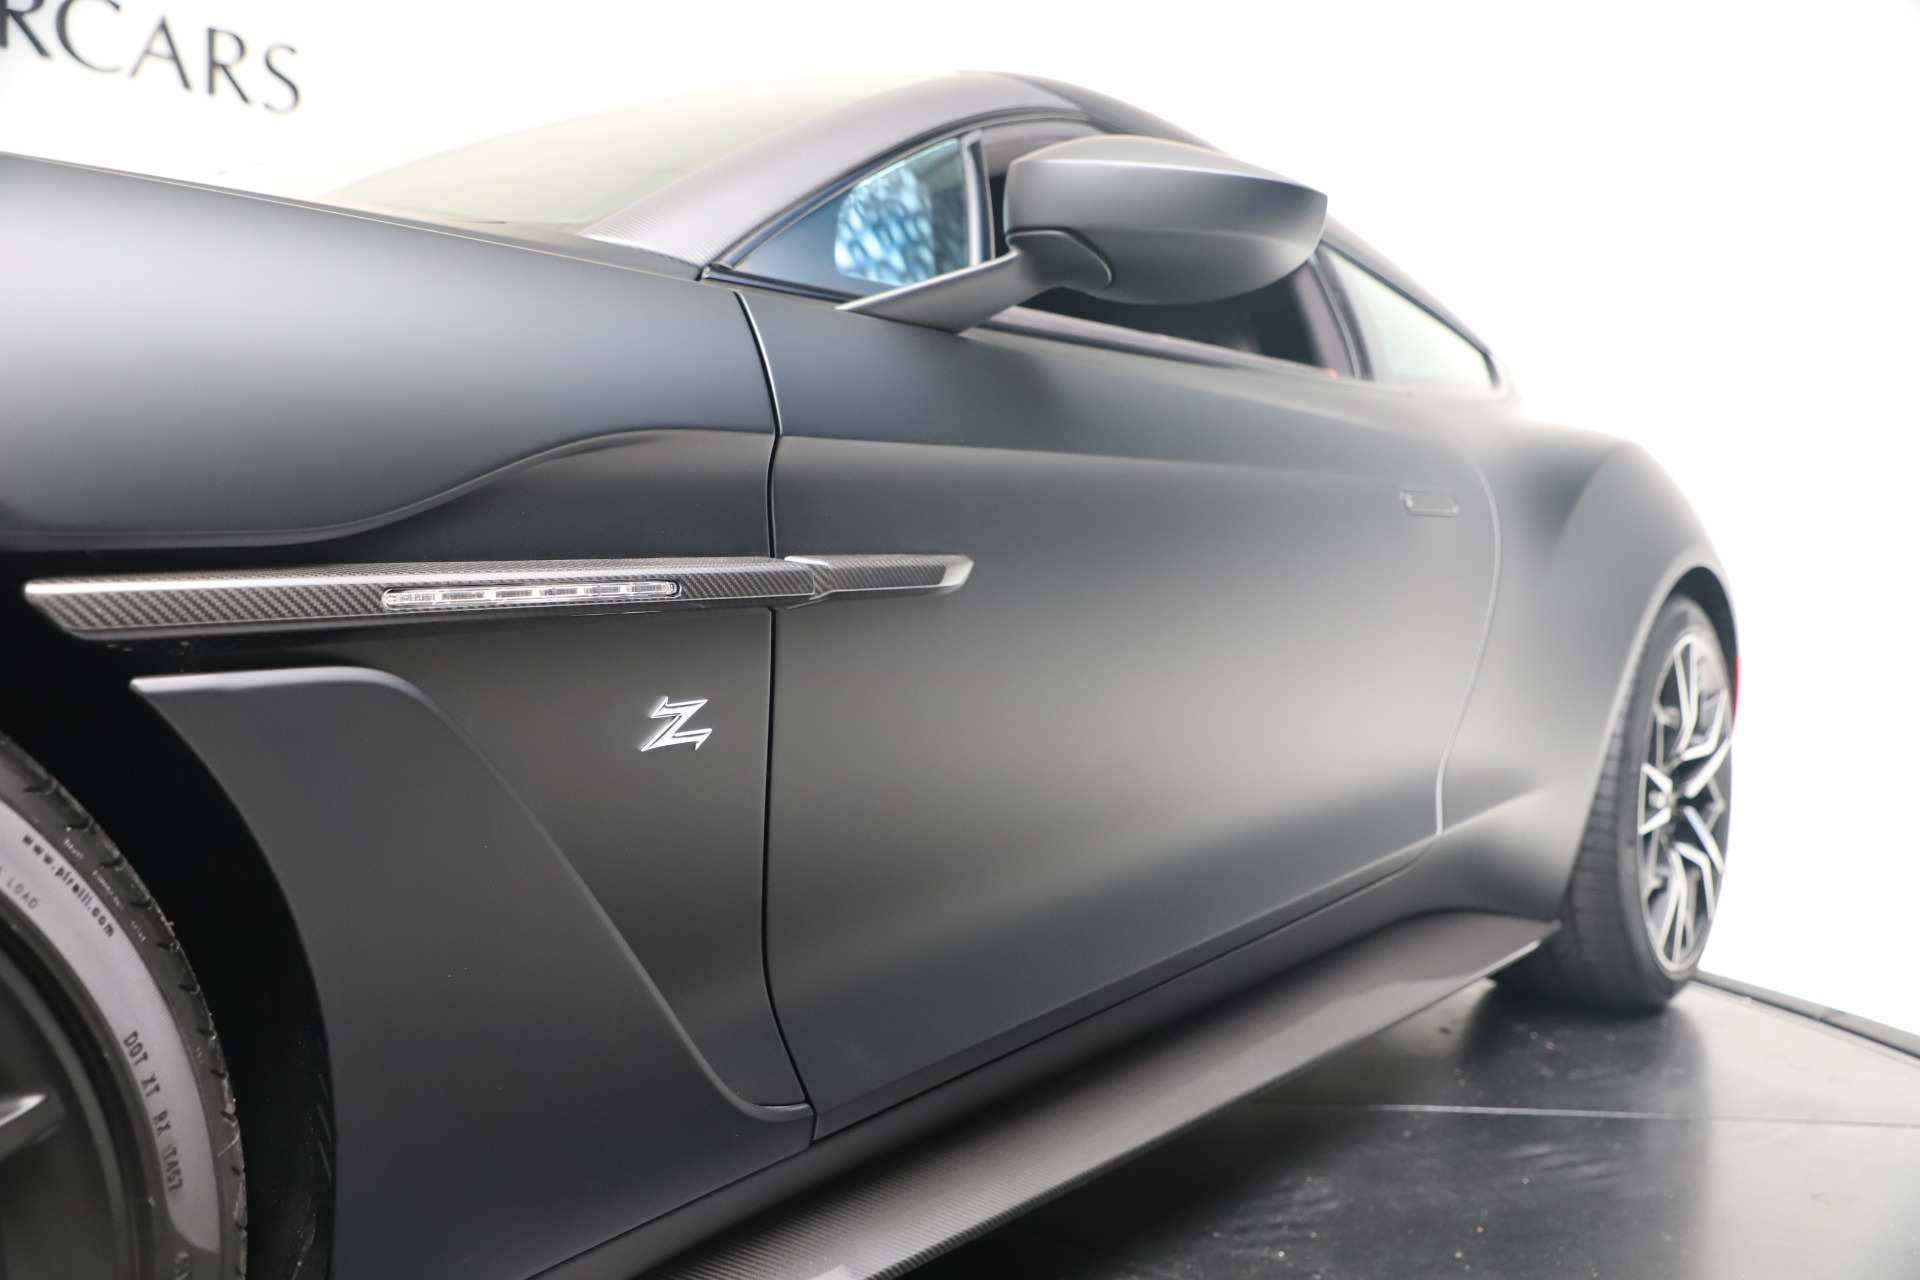 New 2019 Aston Martin Vanquish Shooting Brake For Sale In Westport, CT 3512_p31